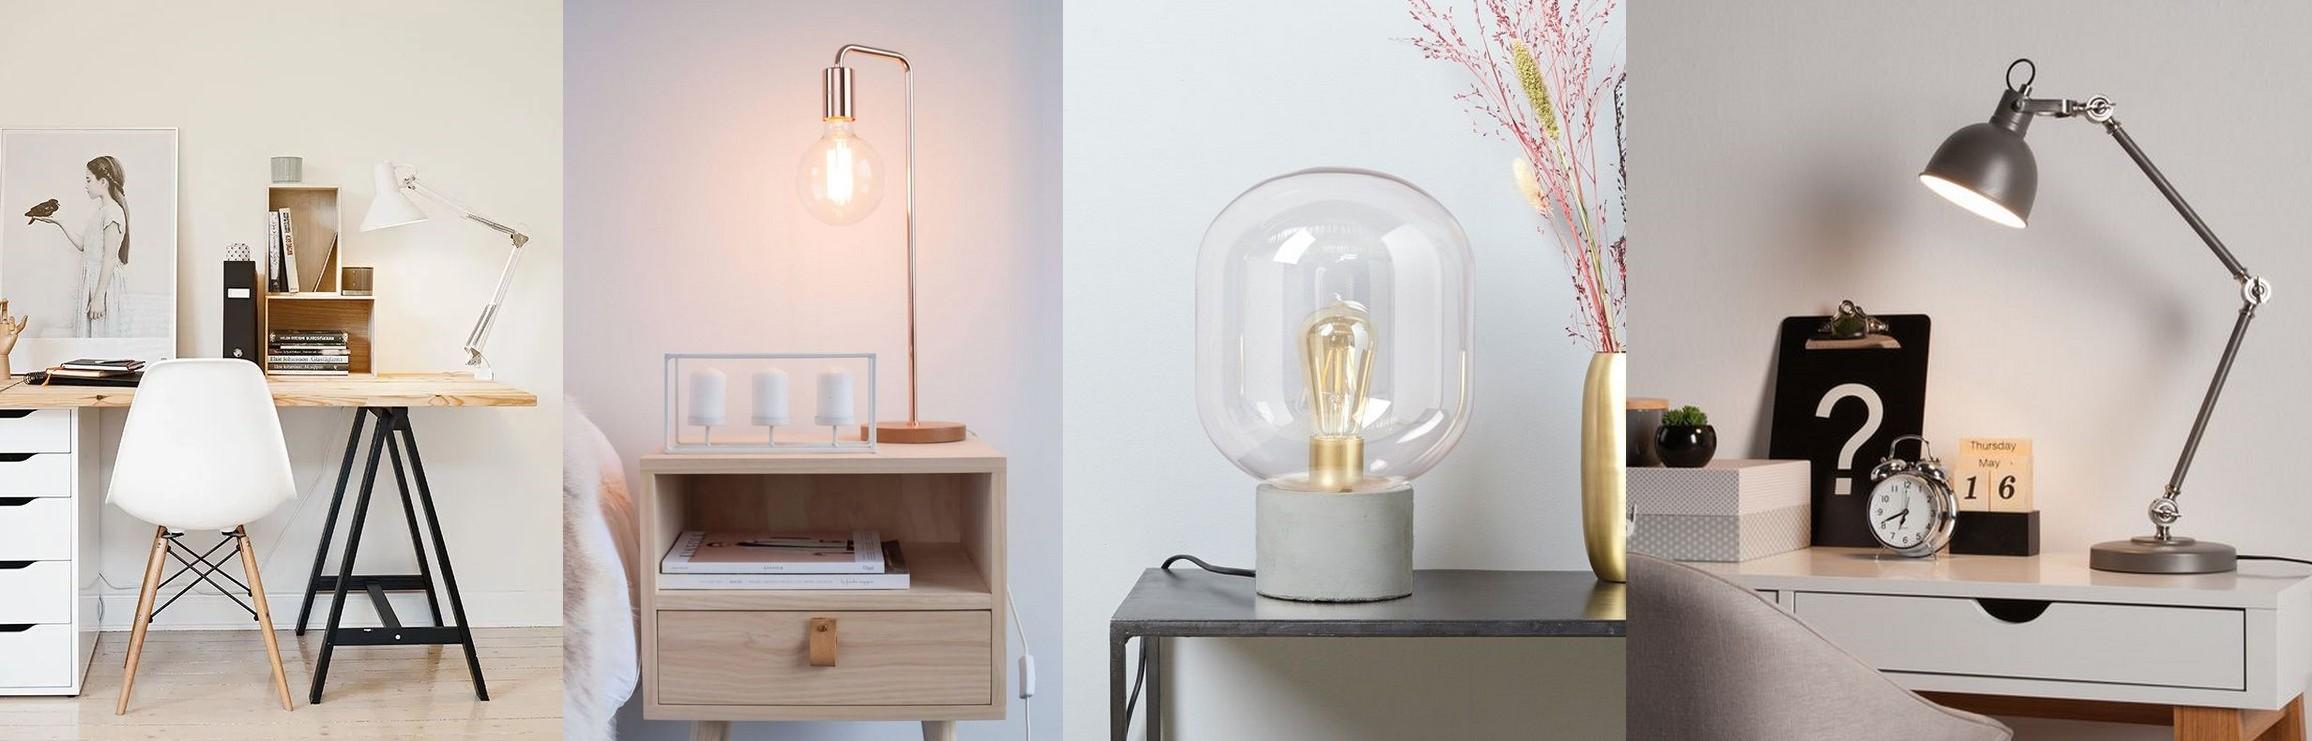 Eclairage lampe a poser (2).jpg